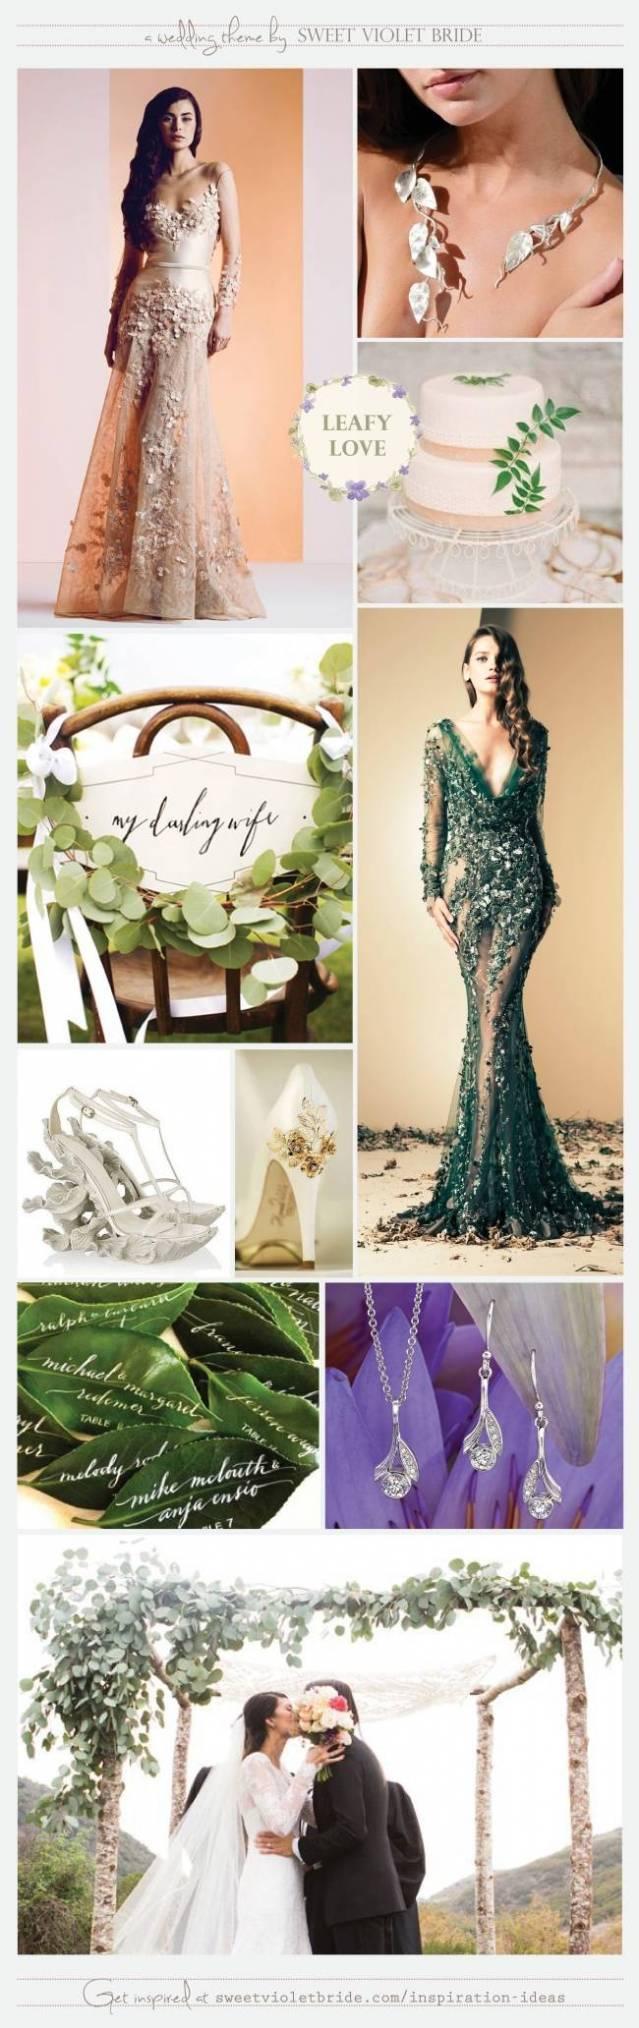 Leafy Love Wedding Theme Board by Sweet Violet Bride - Leaf Leaves